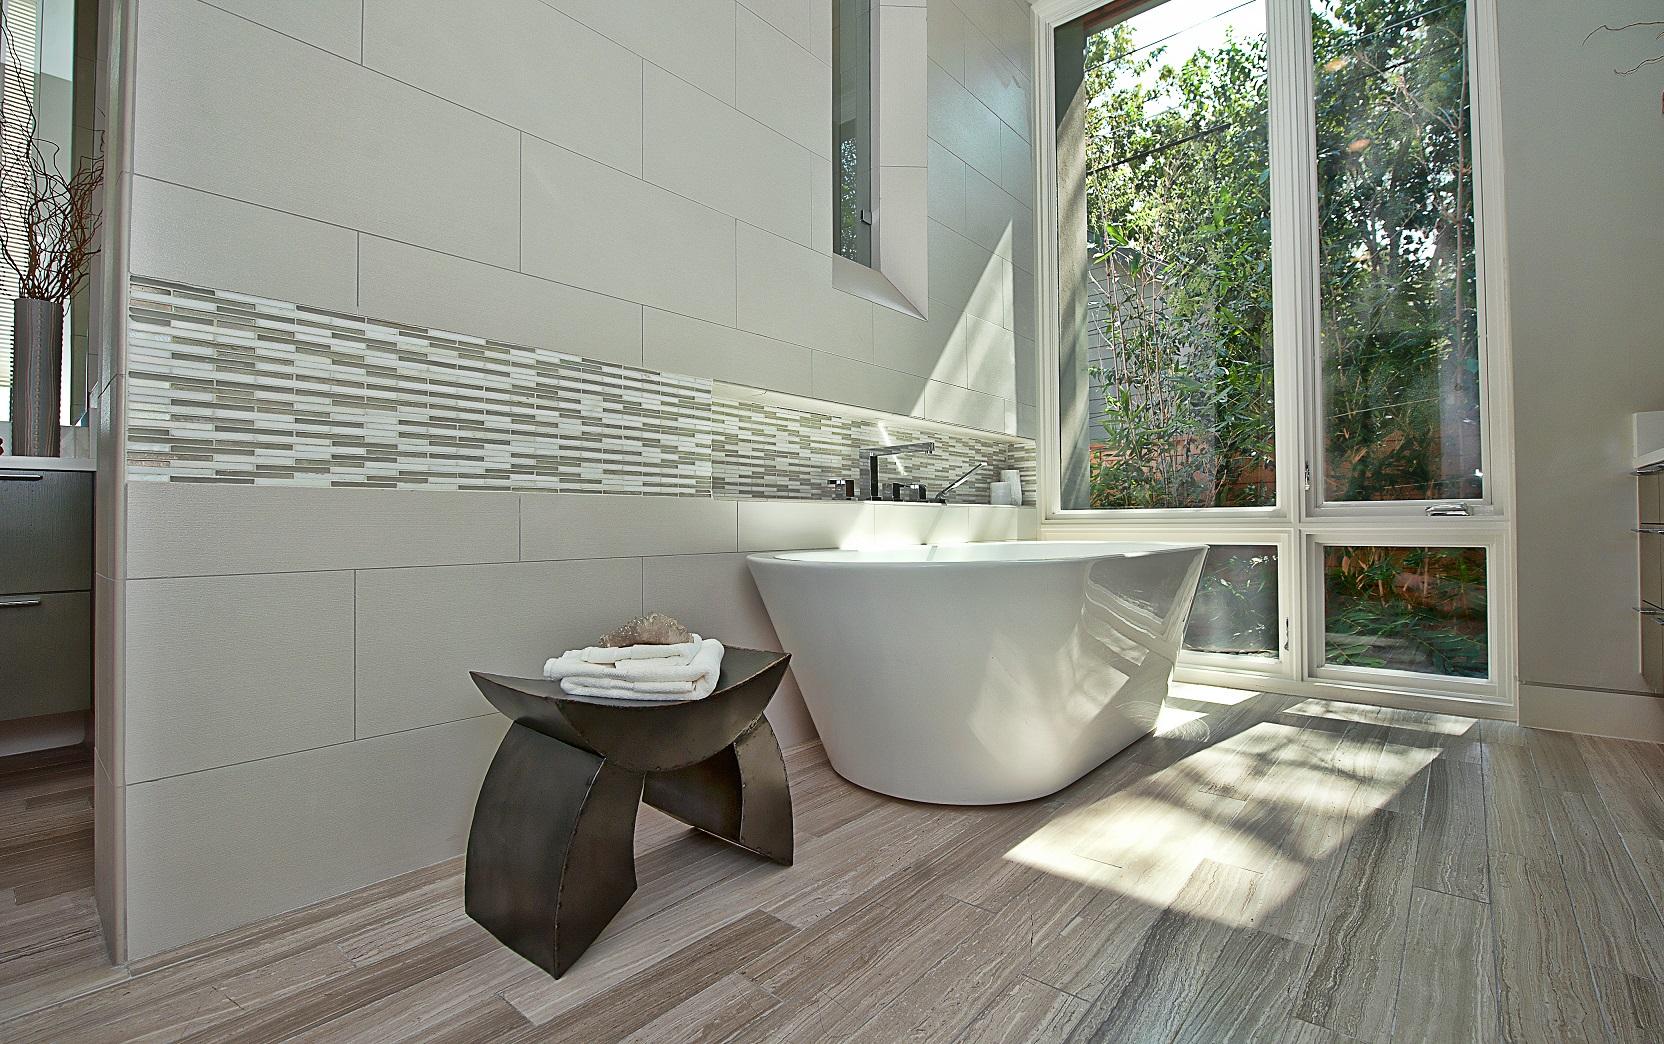 bowman-bathtub